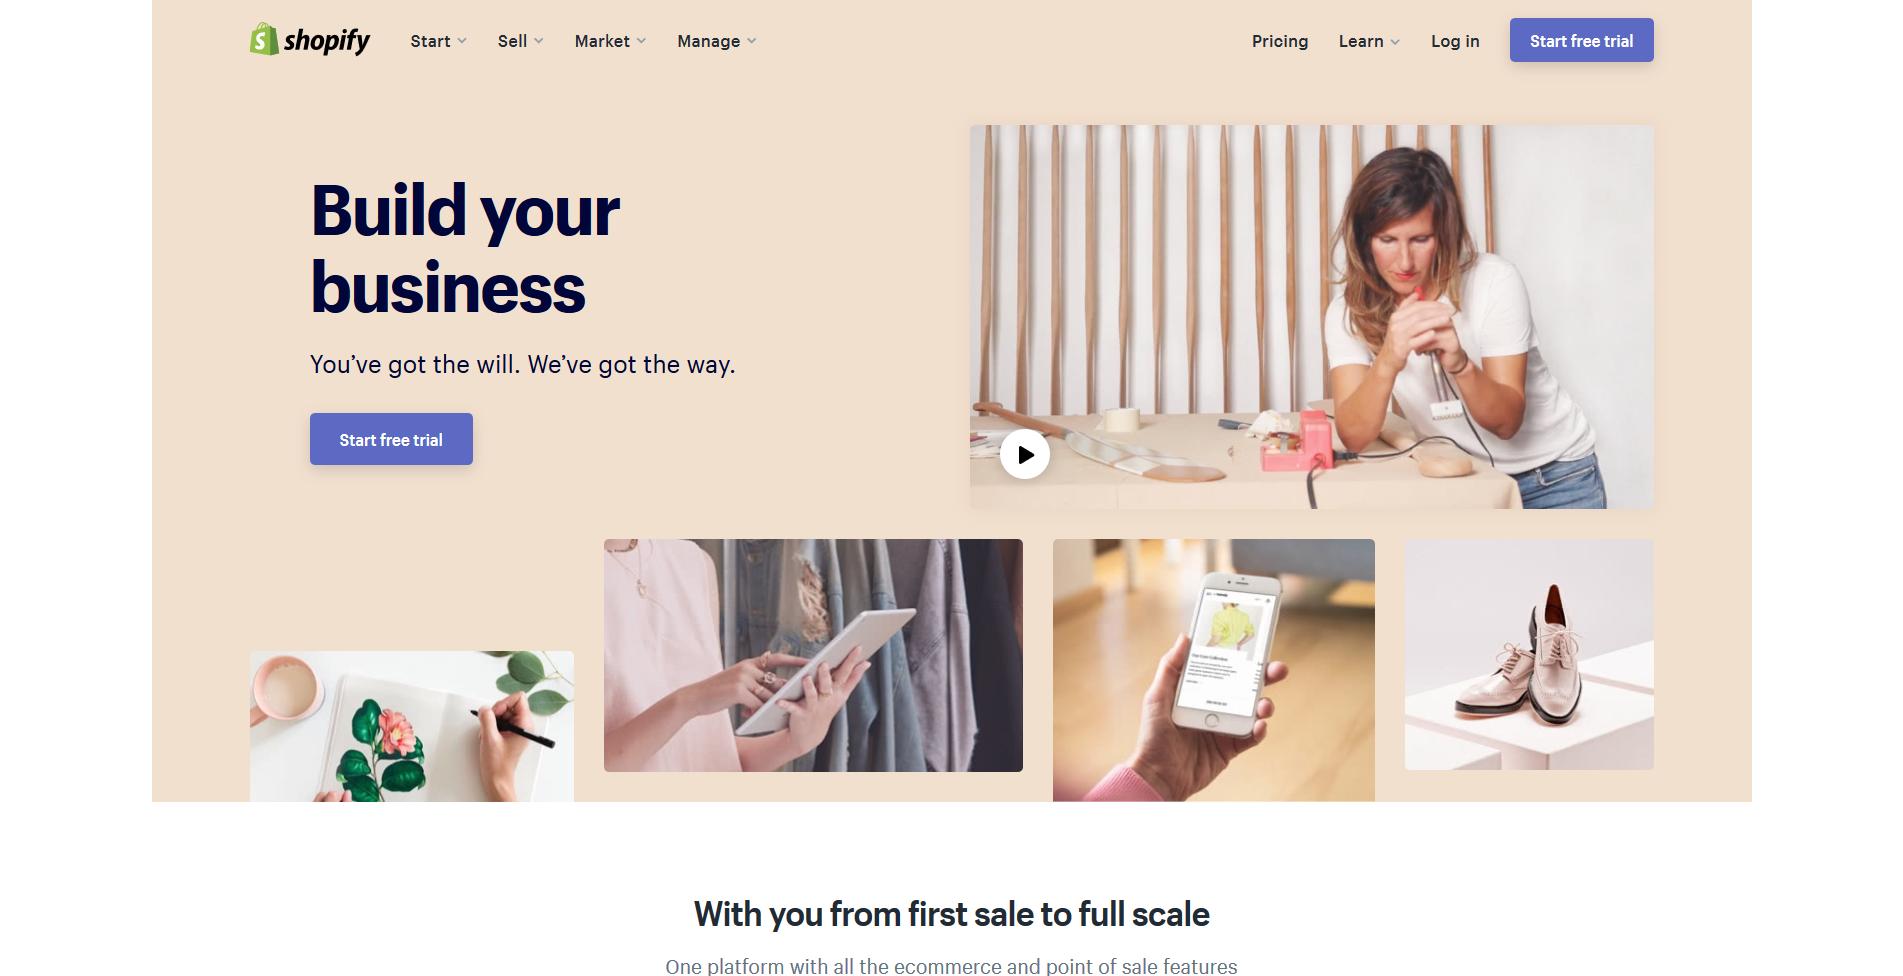 shopify-squarespace.png